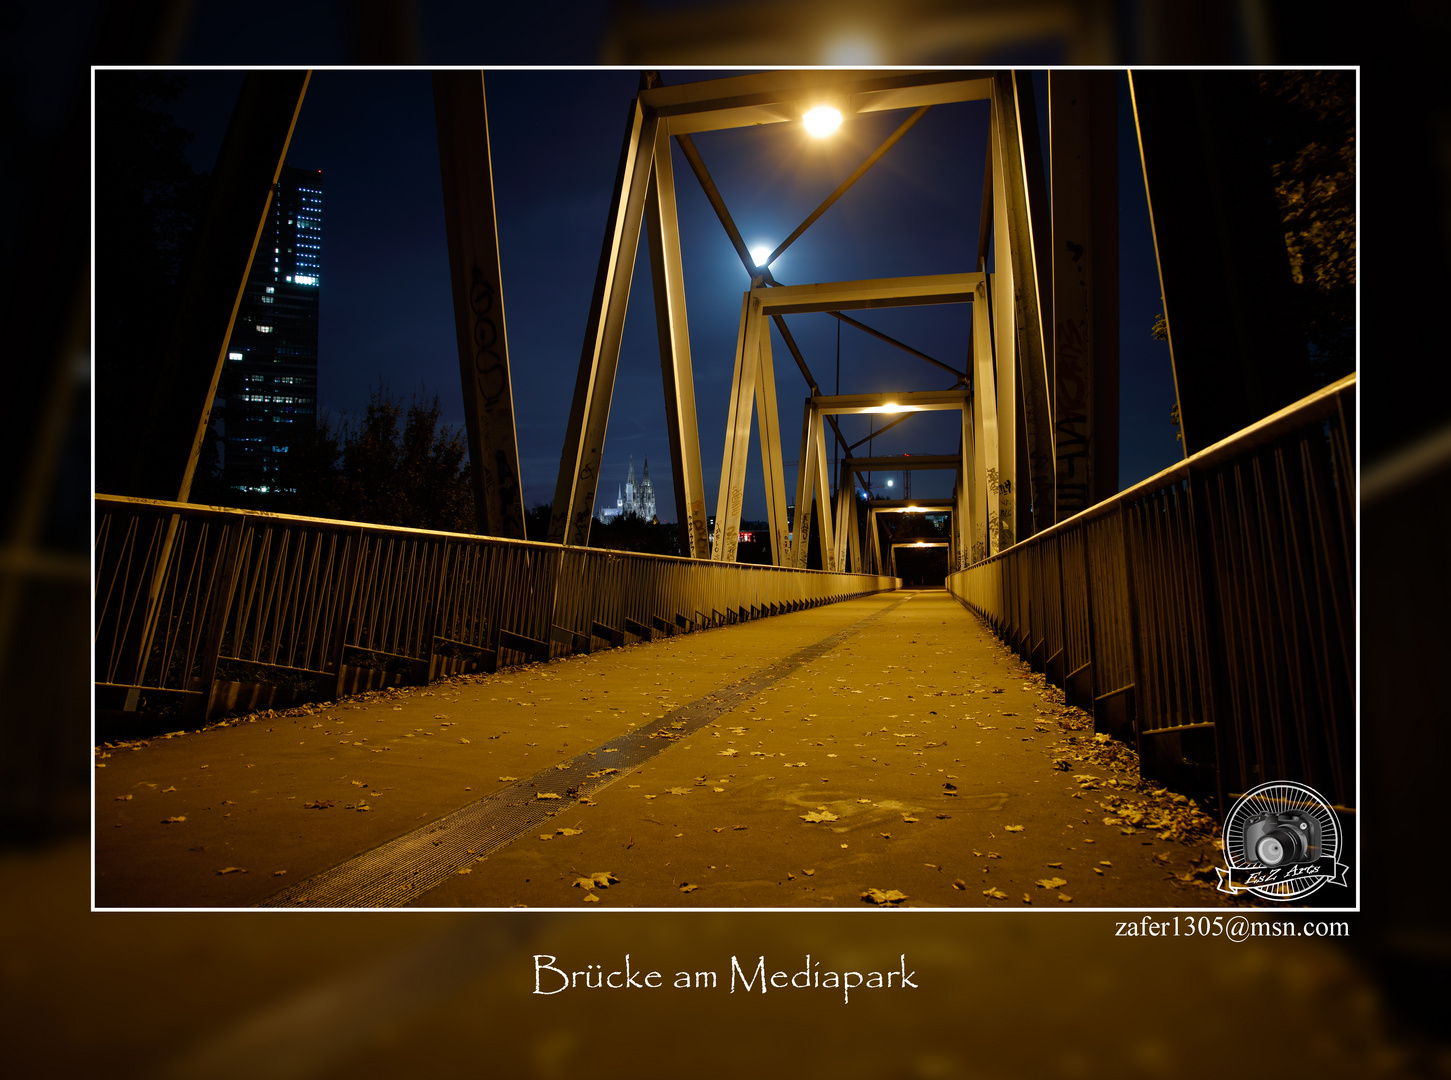 Brücke am Mediapark